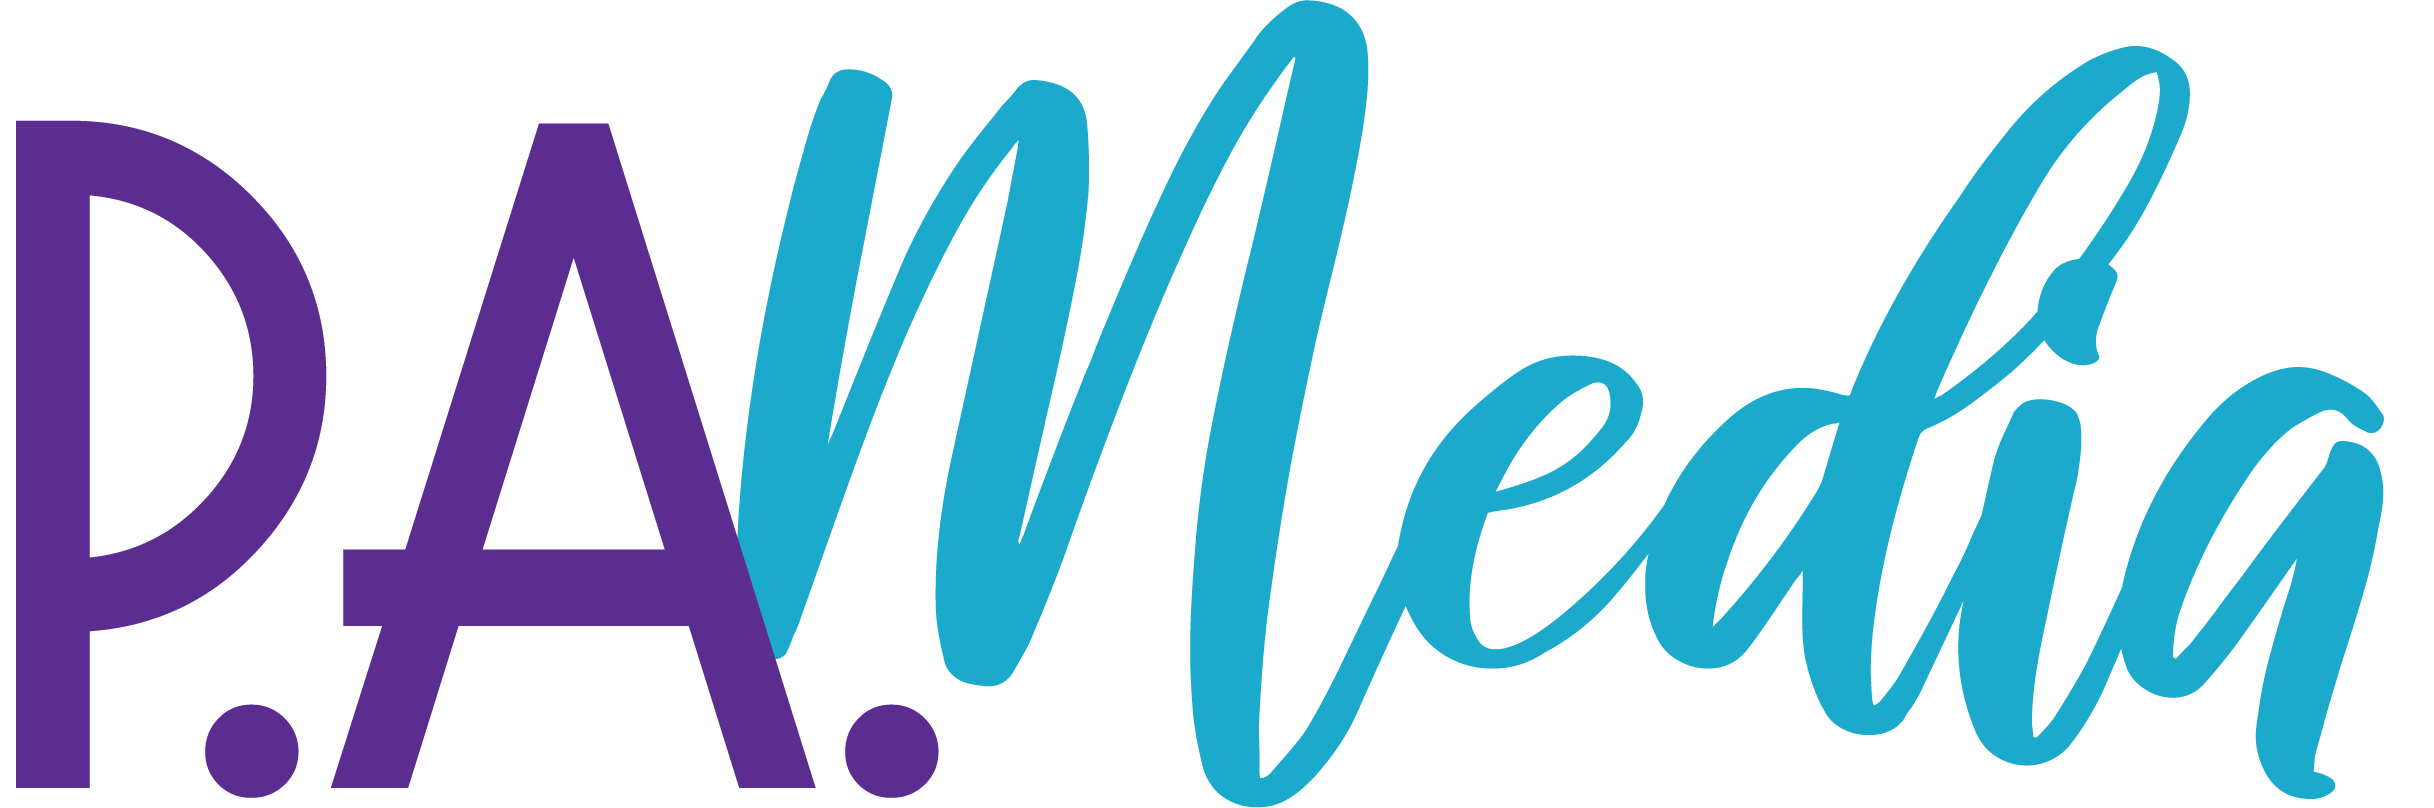 PAMedia Marketing